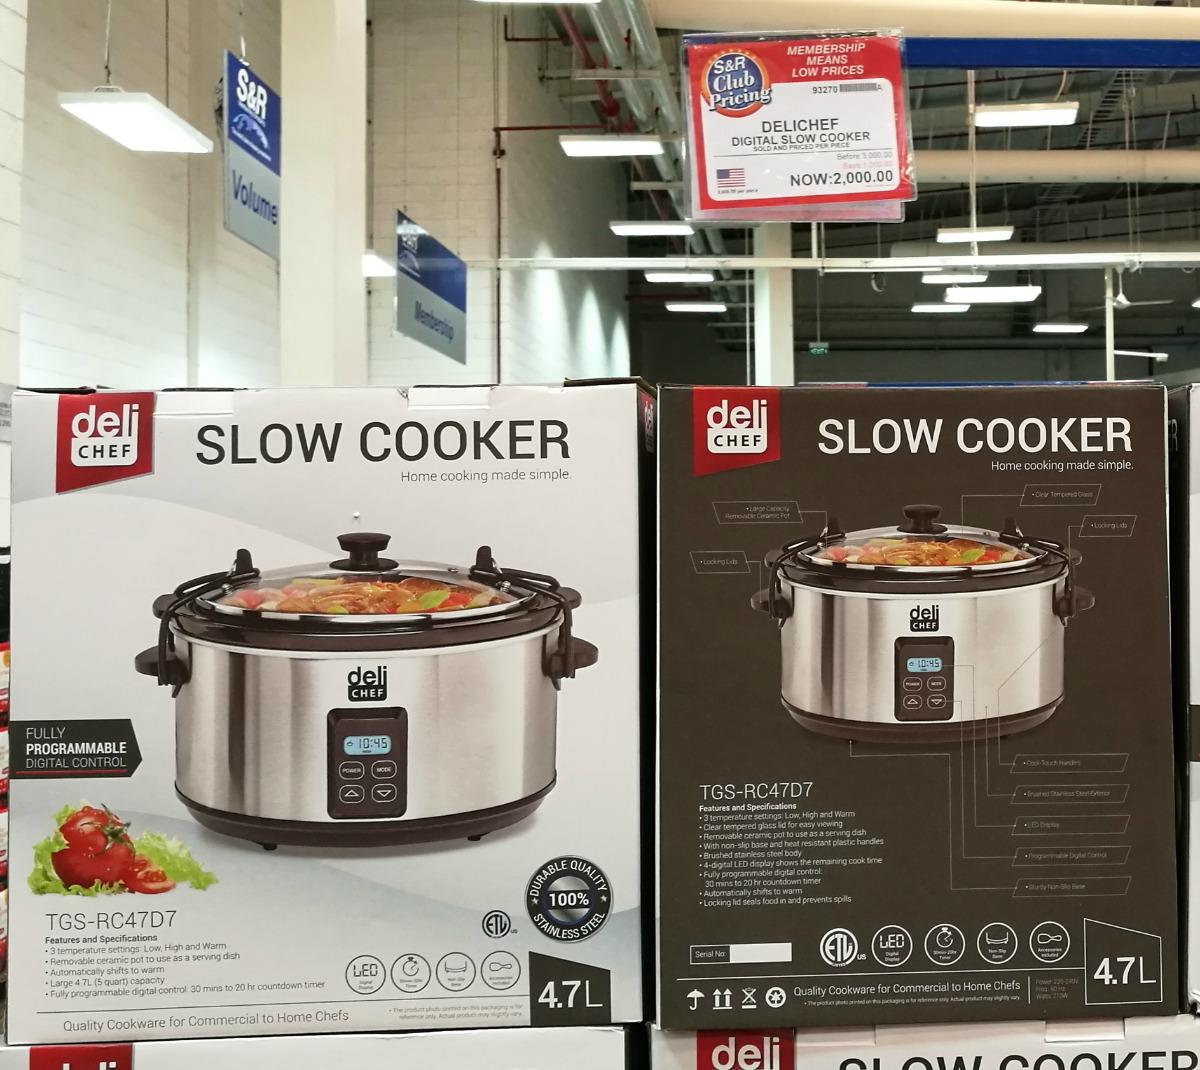 SnR Delichef Digital Slow Cooker